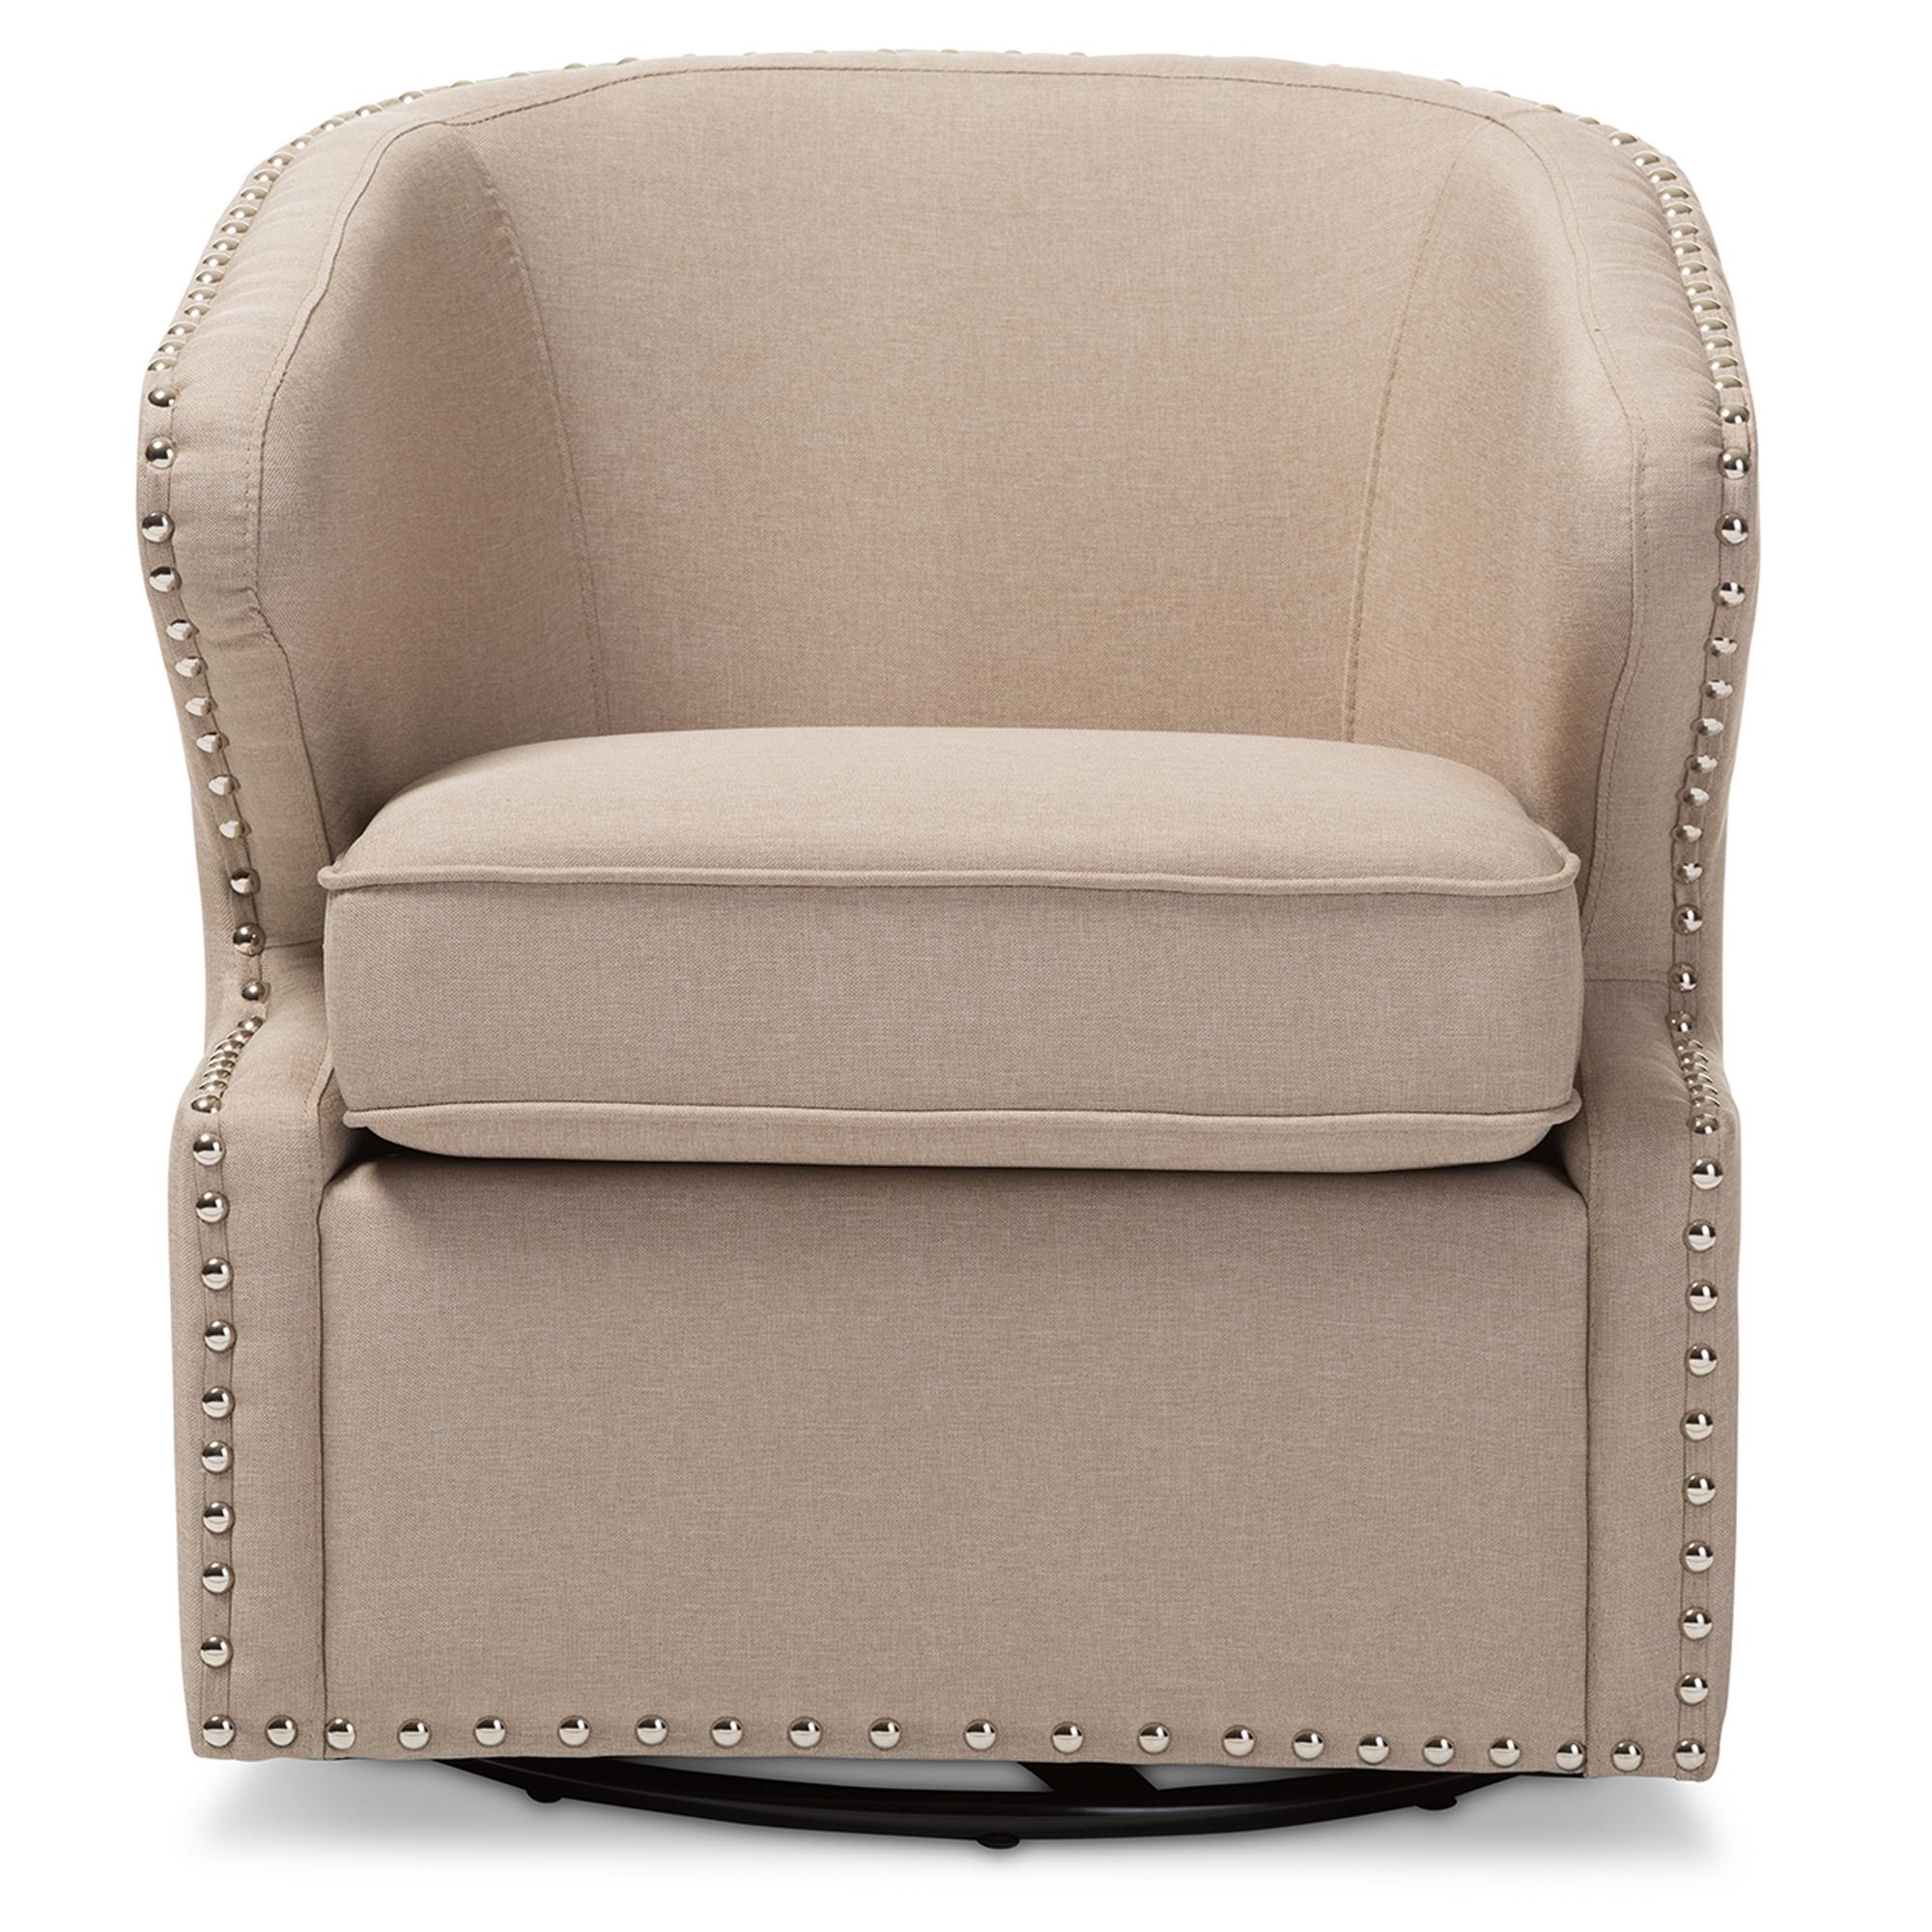 Merveilleux Baxton Studio Finley Mid Century Modern Beige Fabric Upholstered Swivel  Armchair   IEDB 203 ...